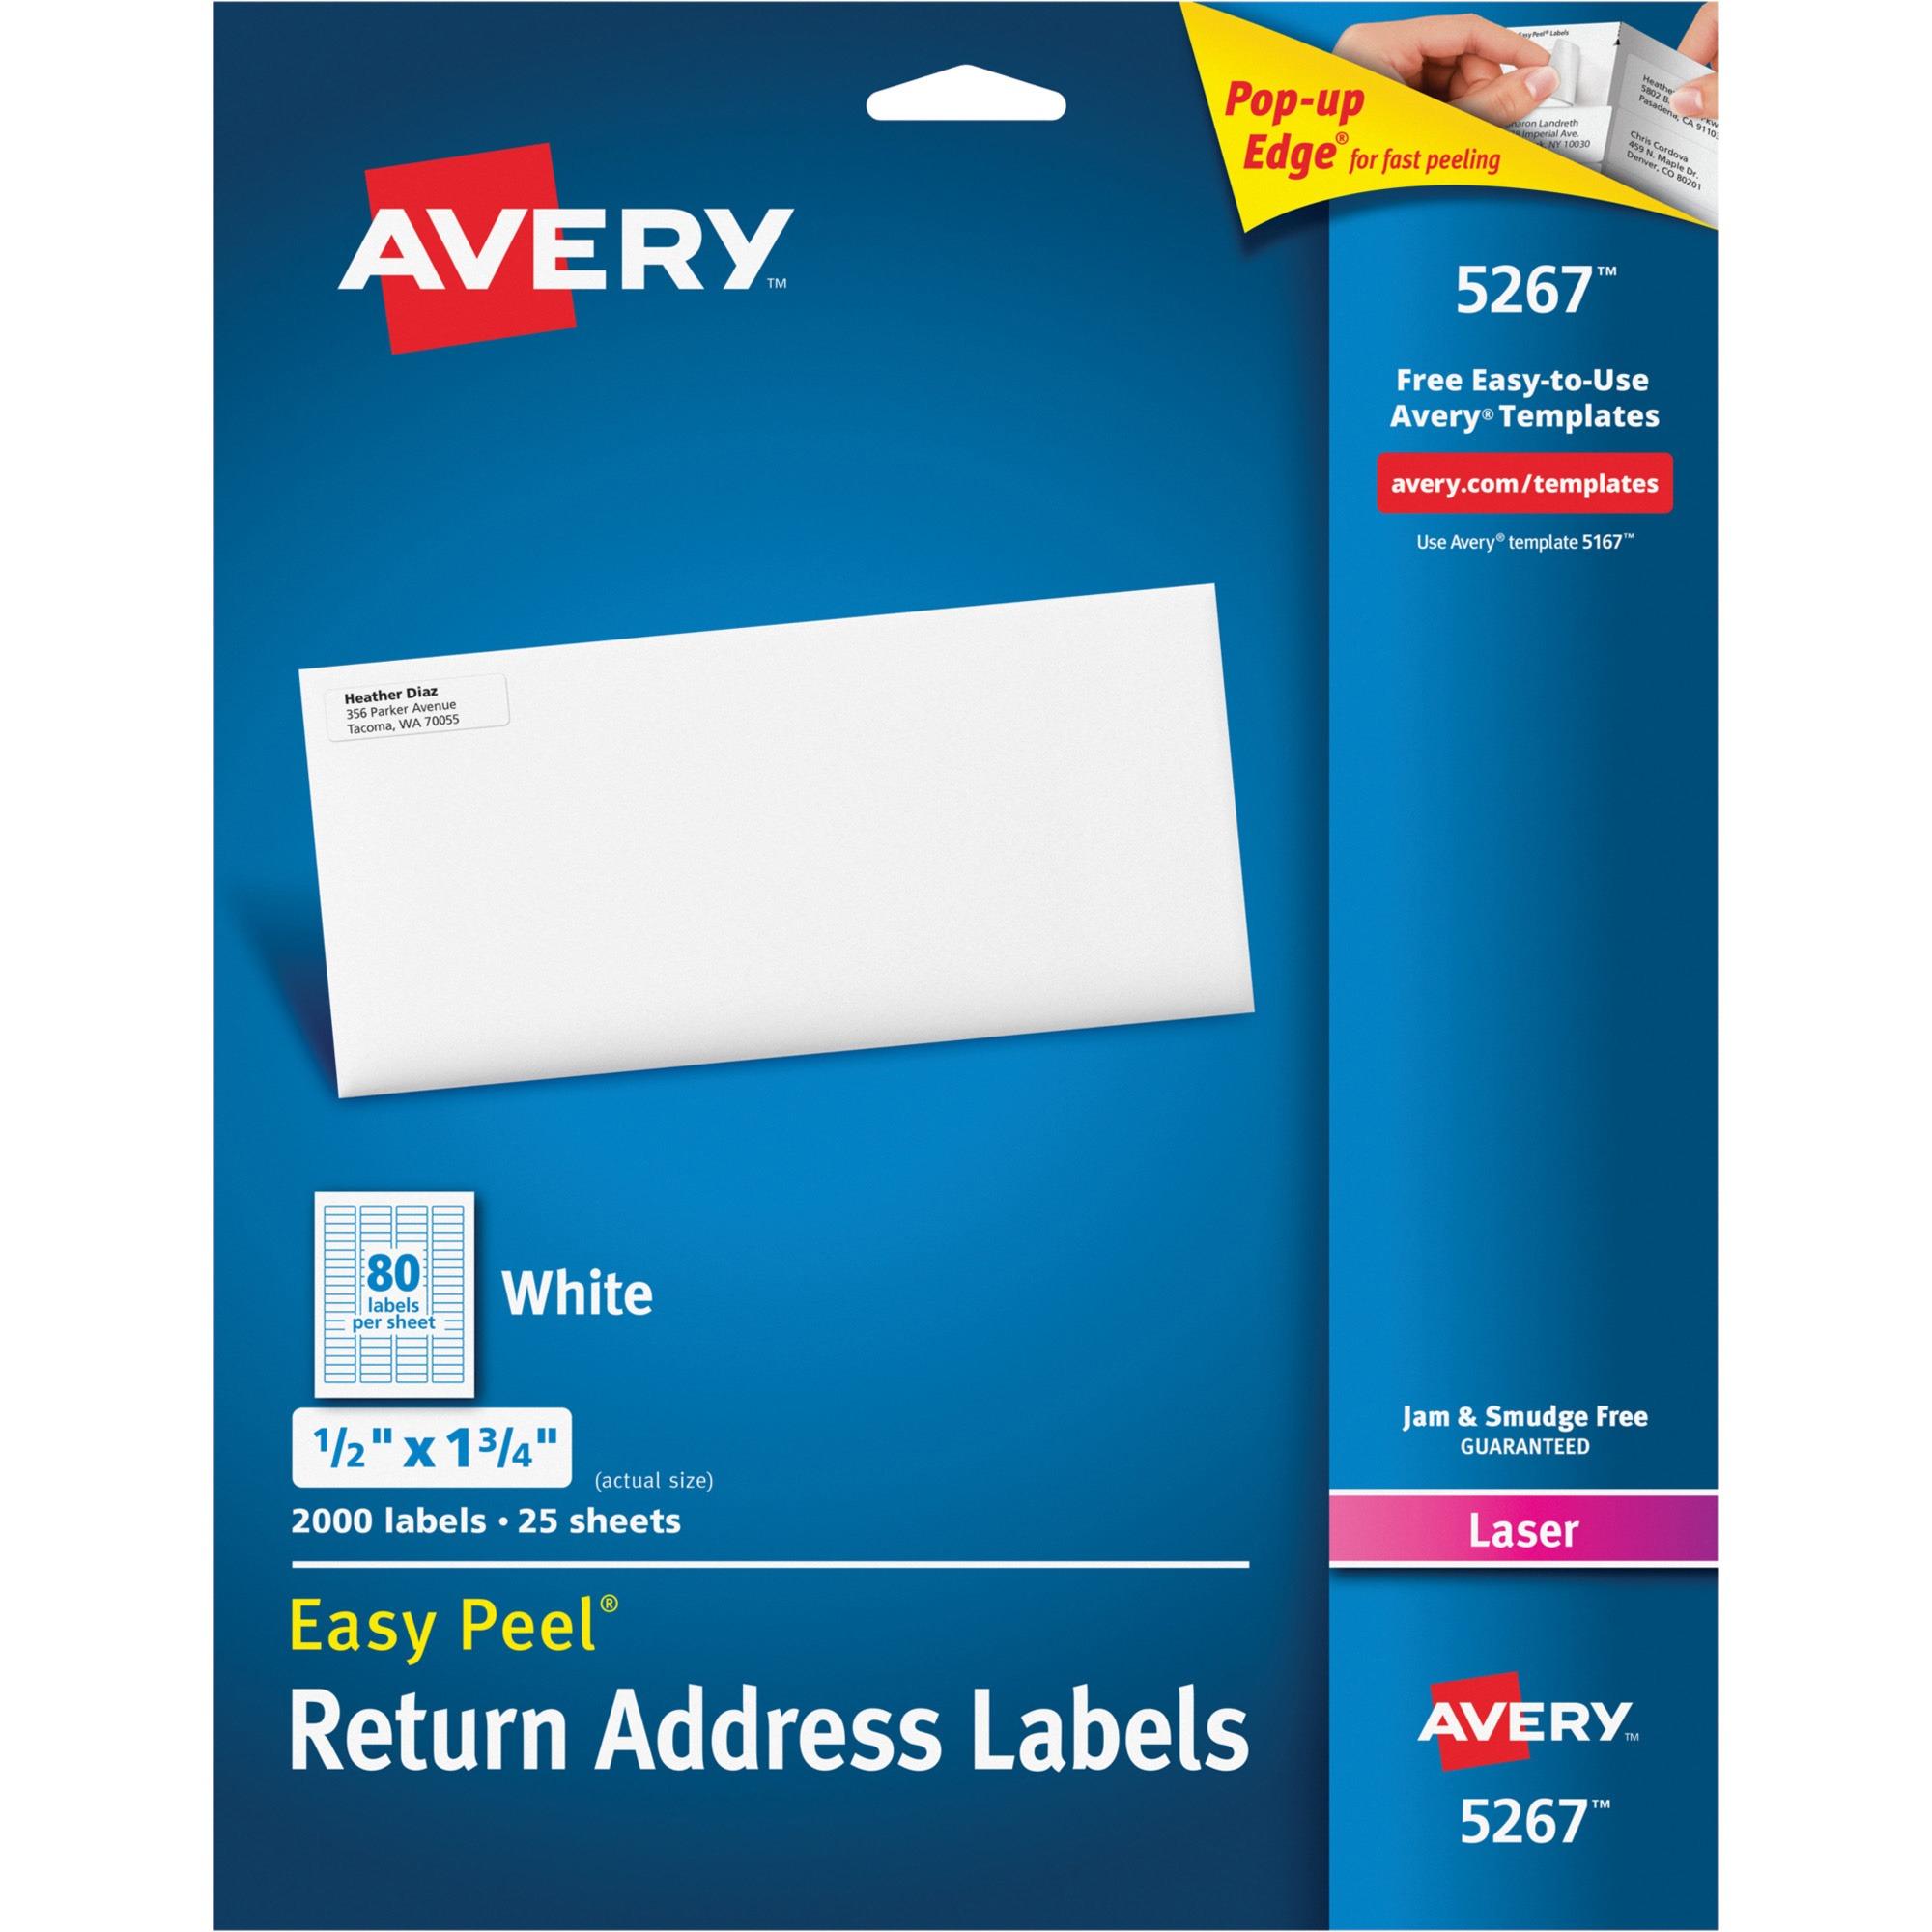 avery templates 5267 download - Roho.4senses.co